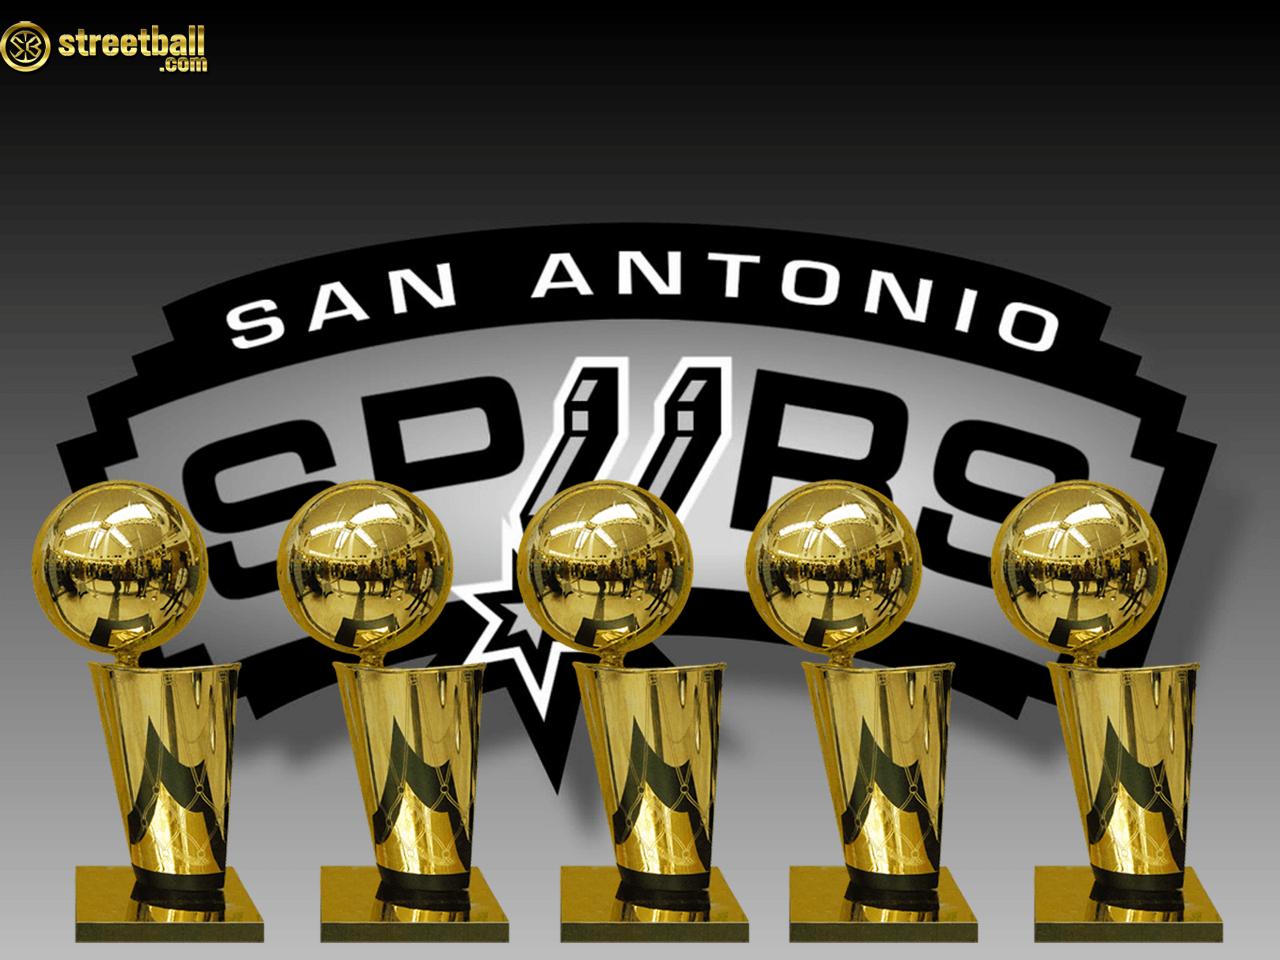 San Antonio Spurs Wallpapers 2017 - Wallpaper Cave  San Antonio Spu...